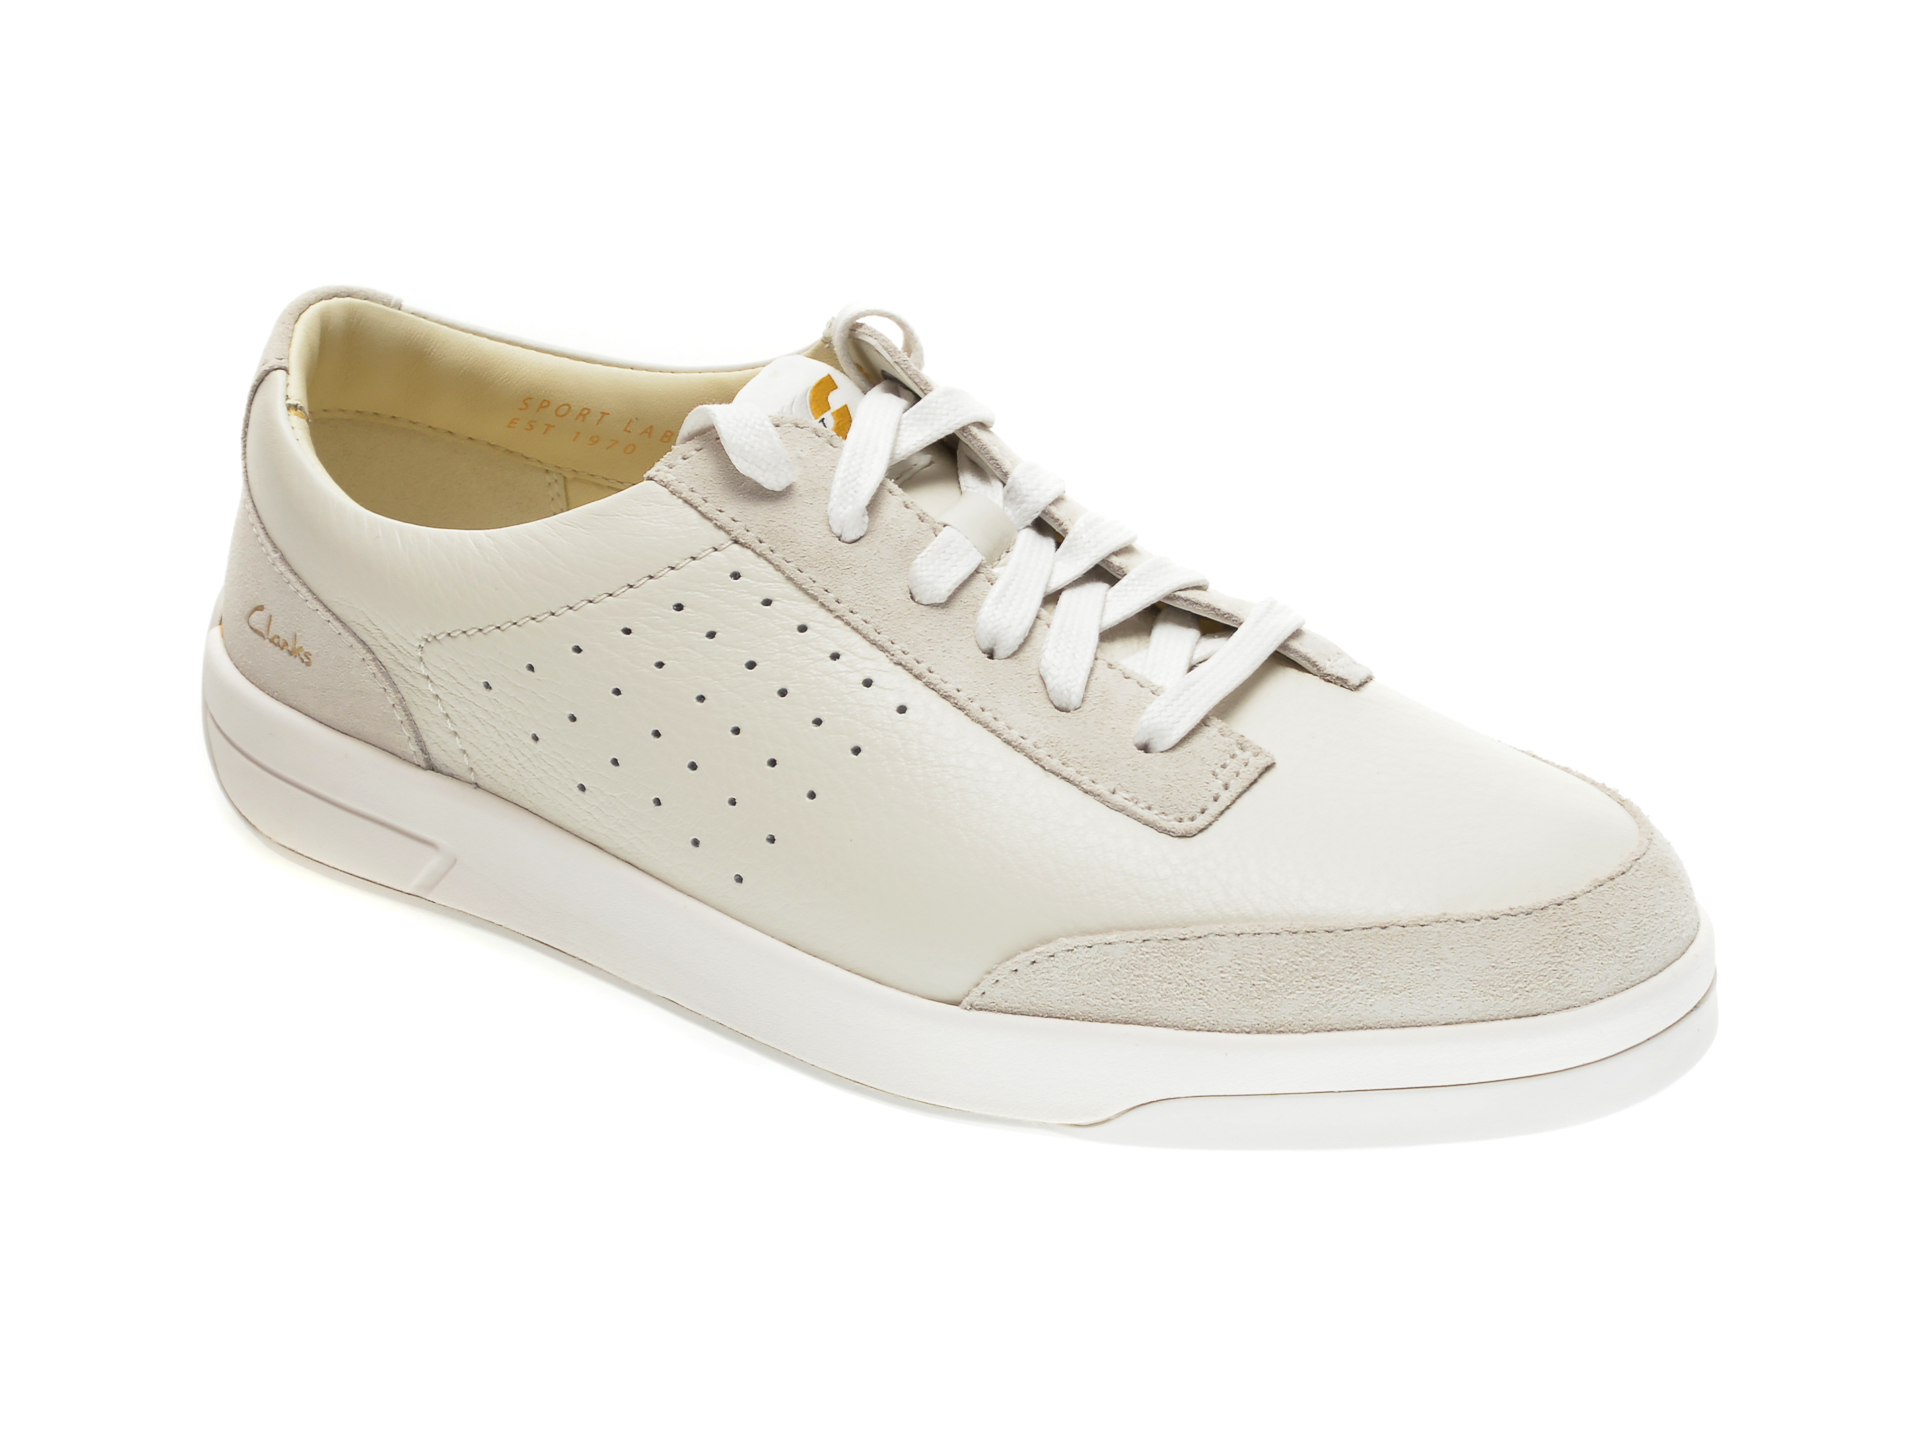 Pantofi CLARKS albi, HERO AIR LACE, din piele naturala imagine